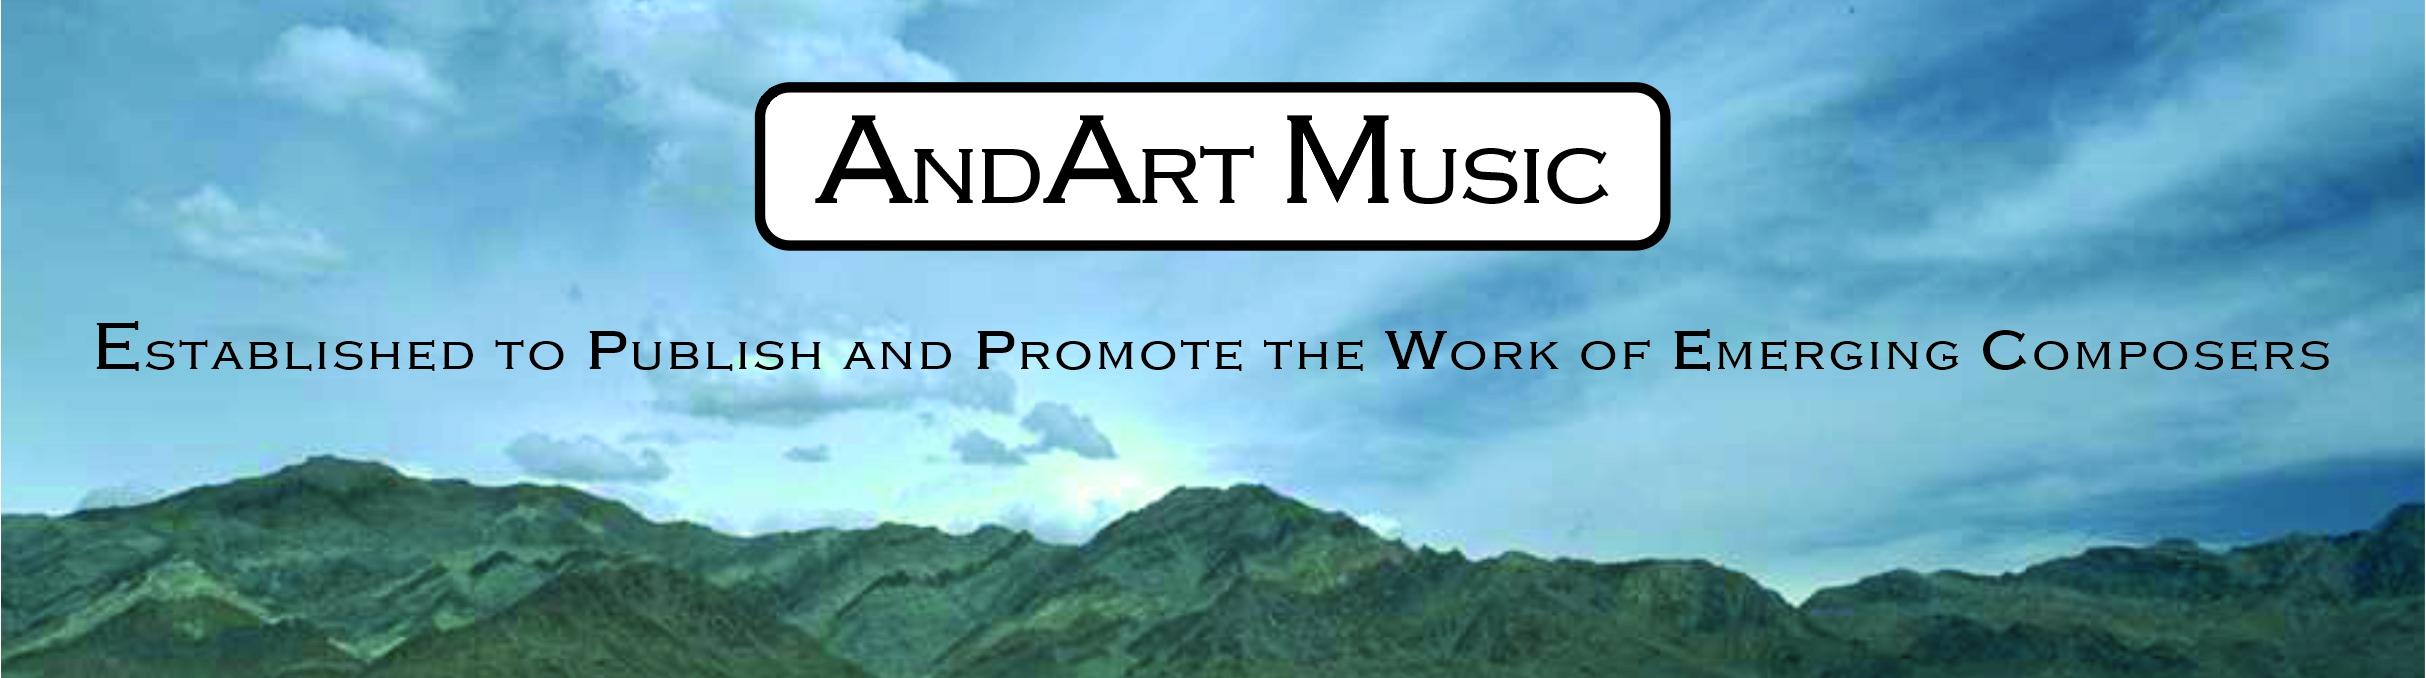 AndArt Music